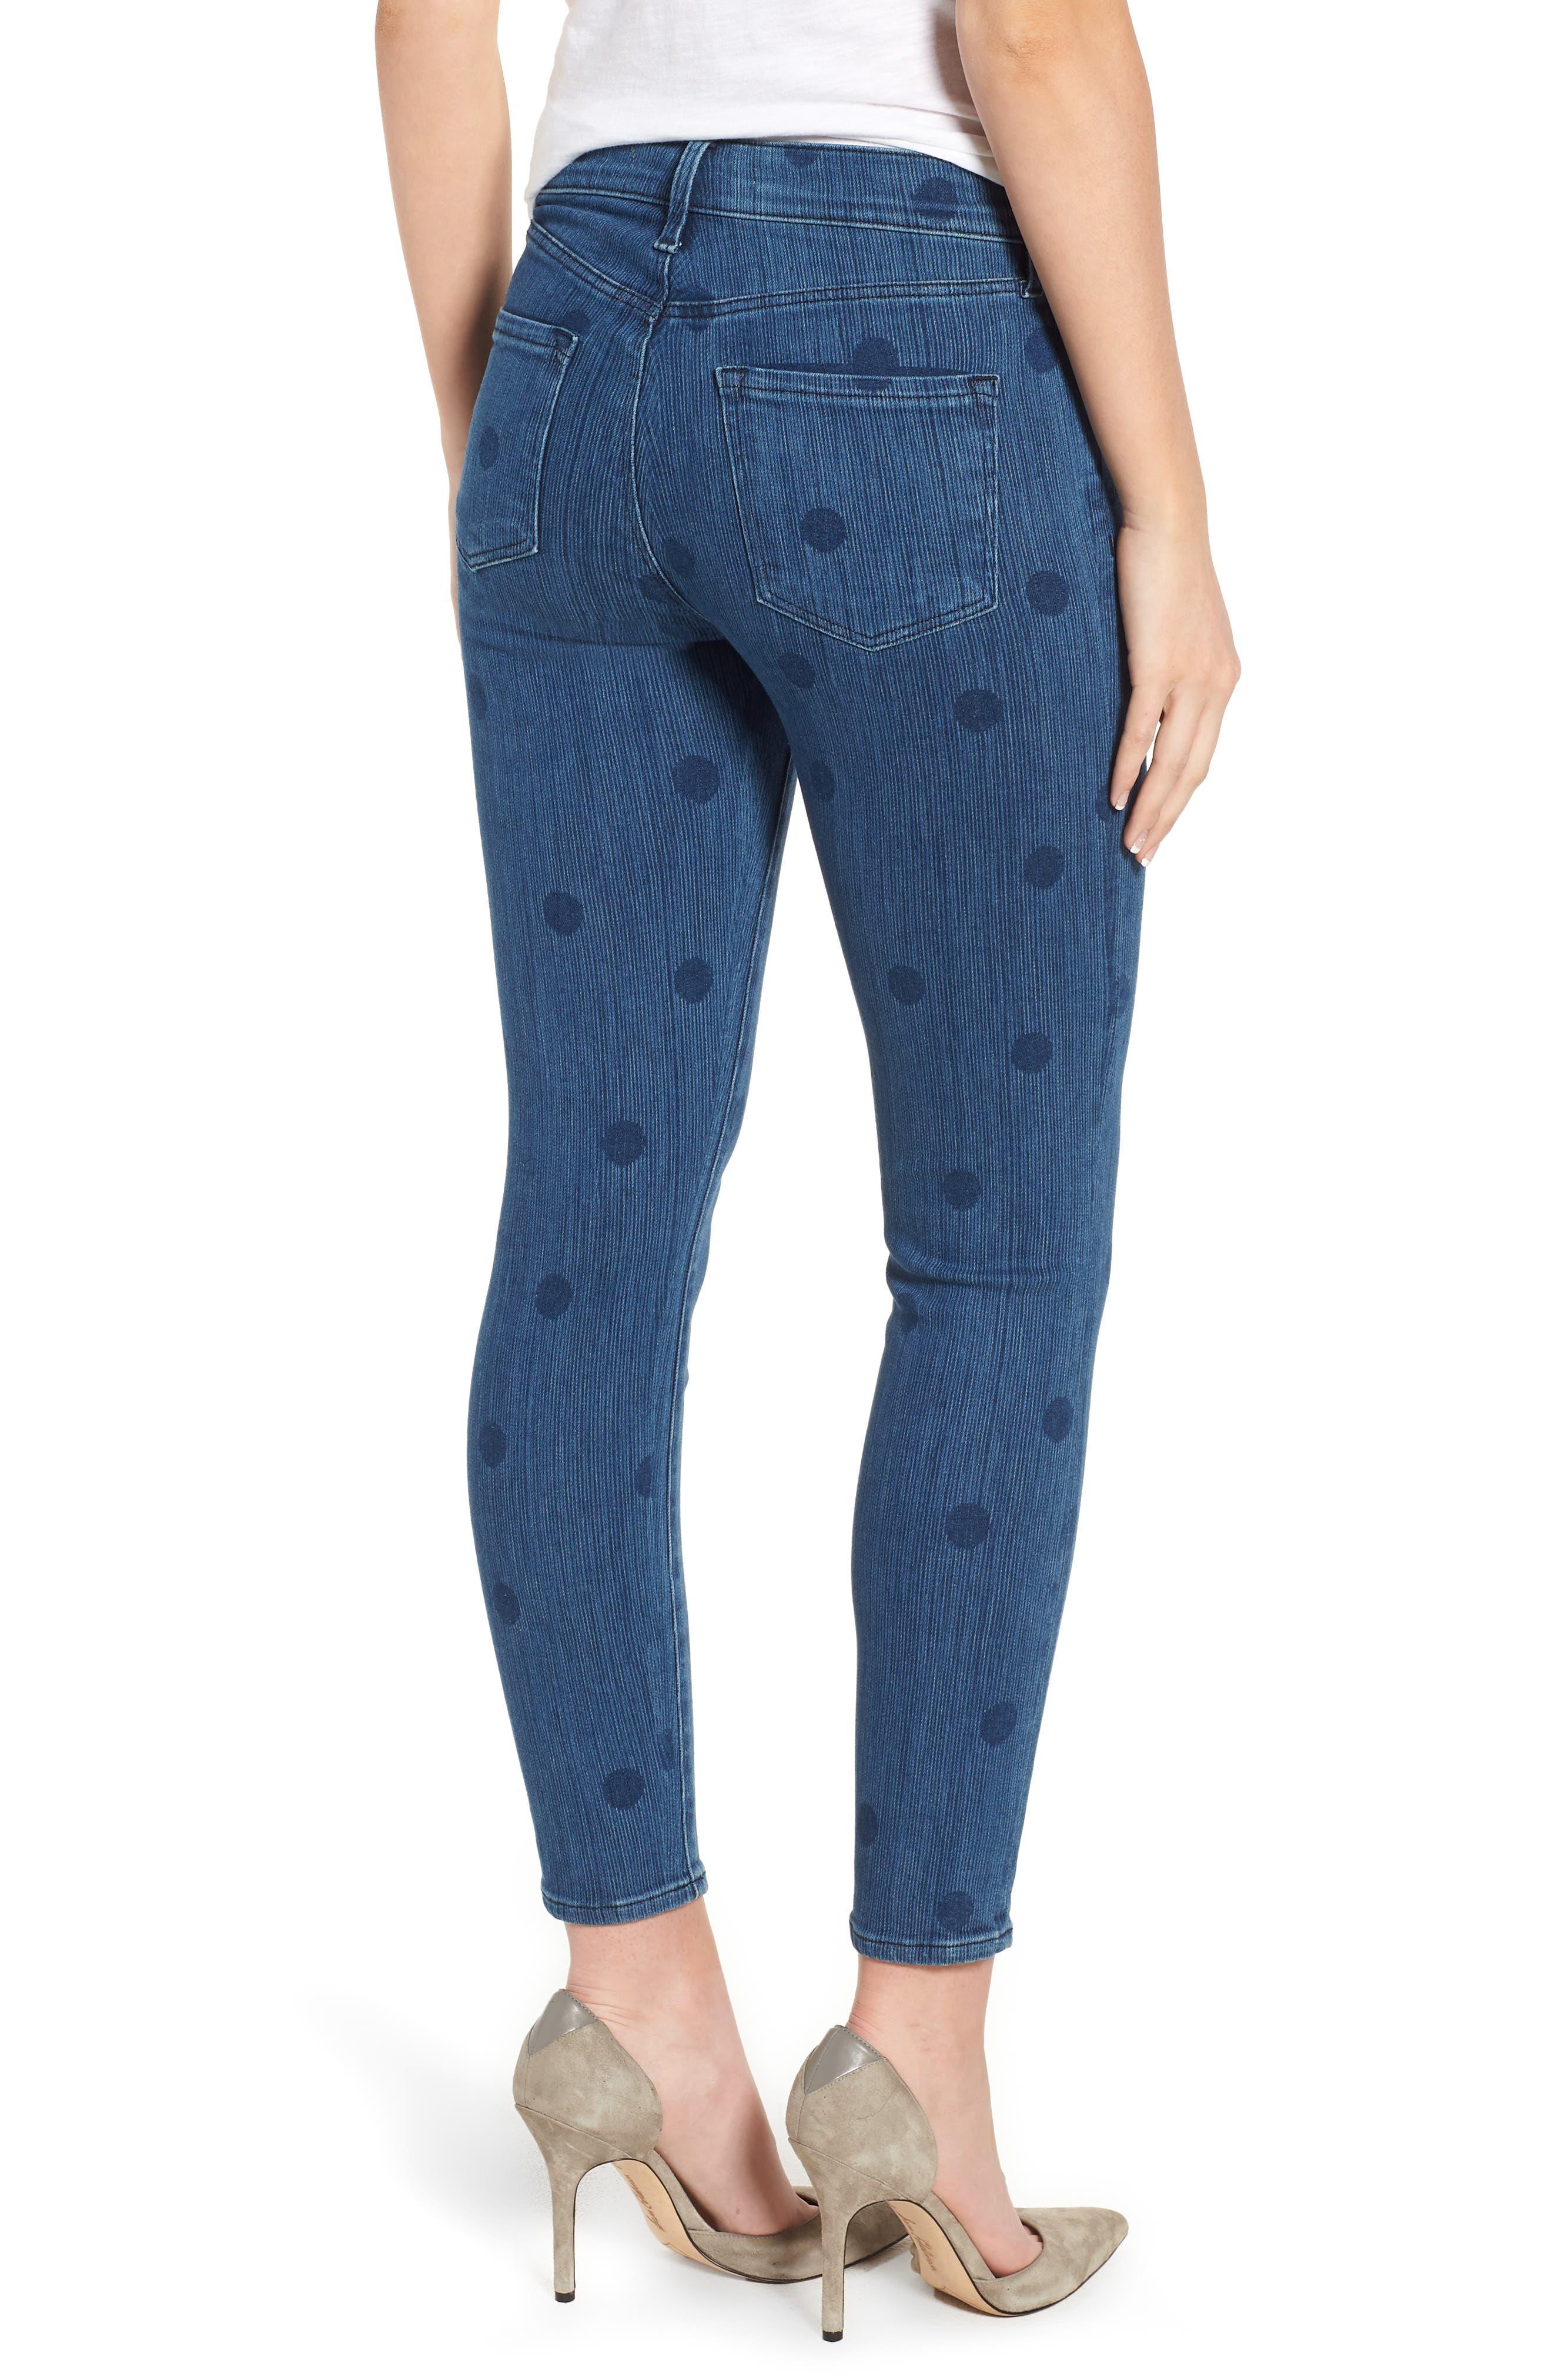 835 Capri Skinny Jeans,                             Alternate thumbnail 2, color,                             400